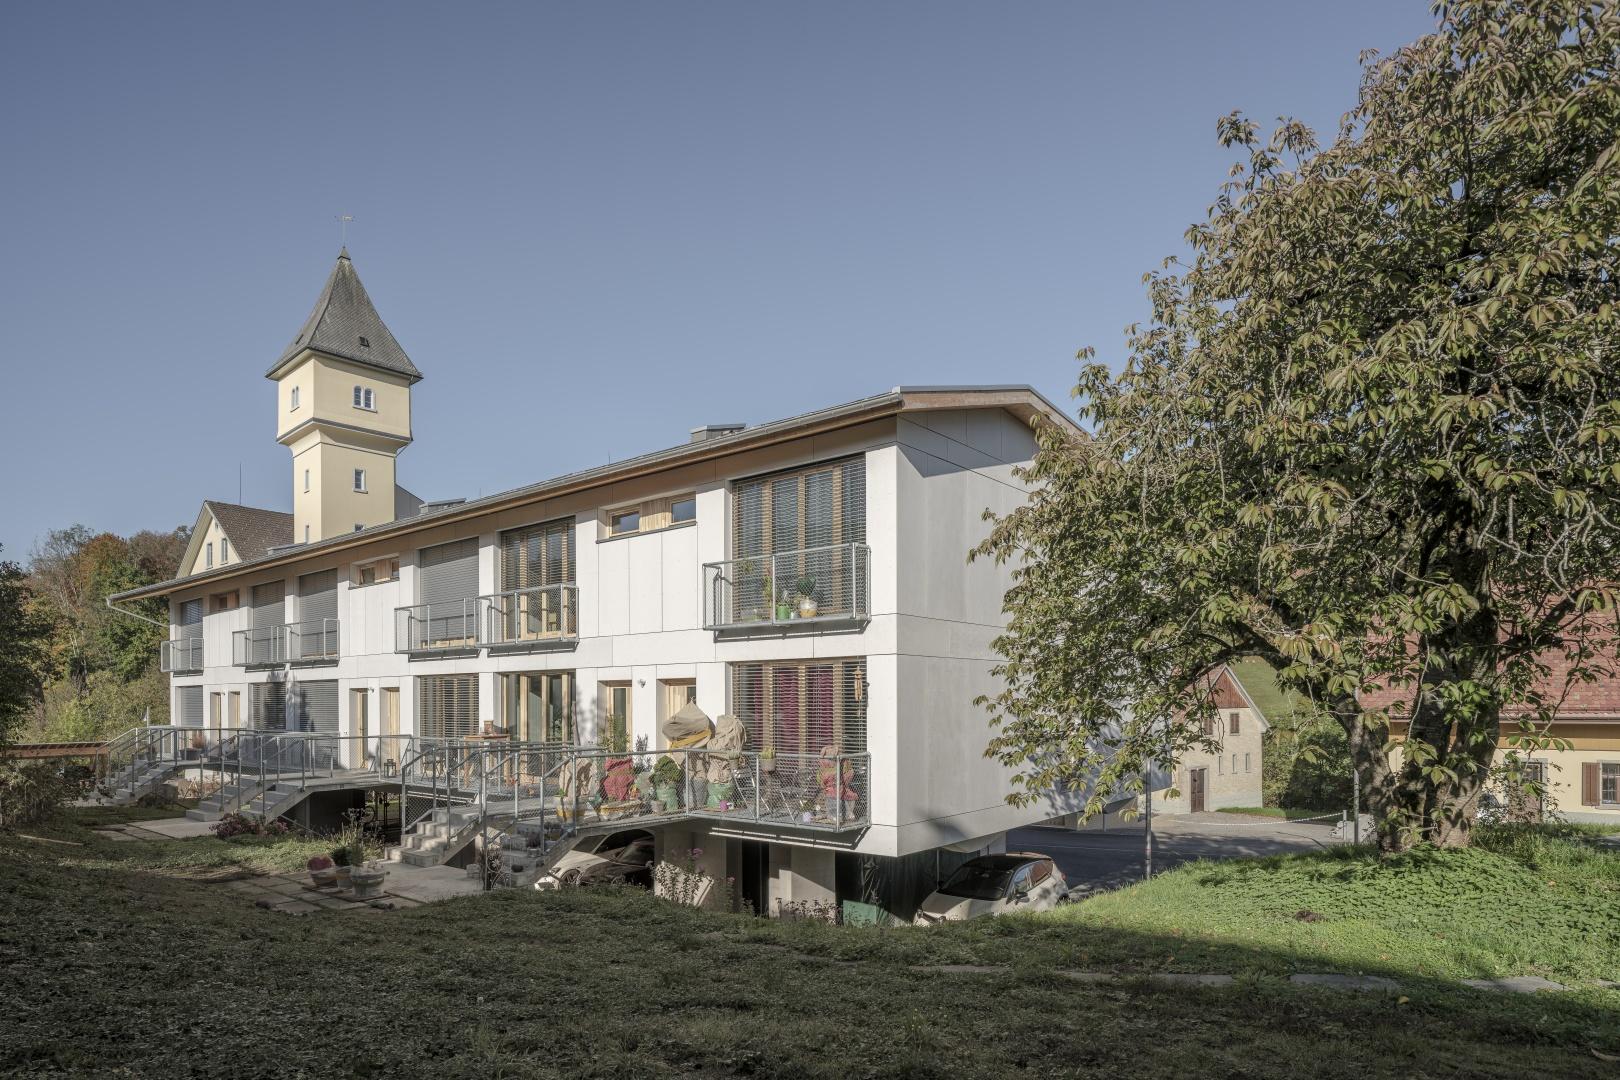 Vue jardin © moos giuliani herrmann architekten, silvano pedrett